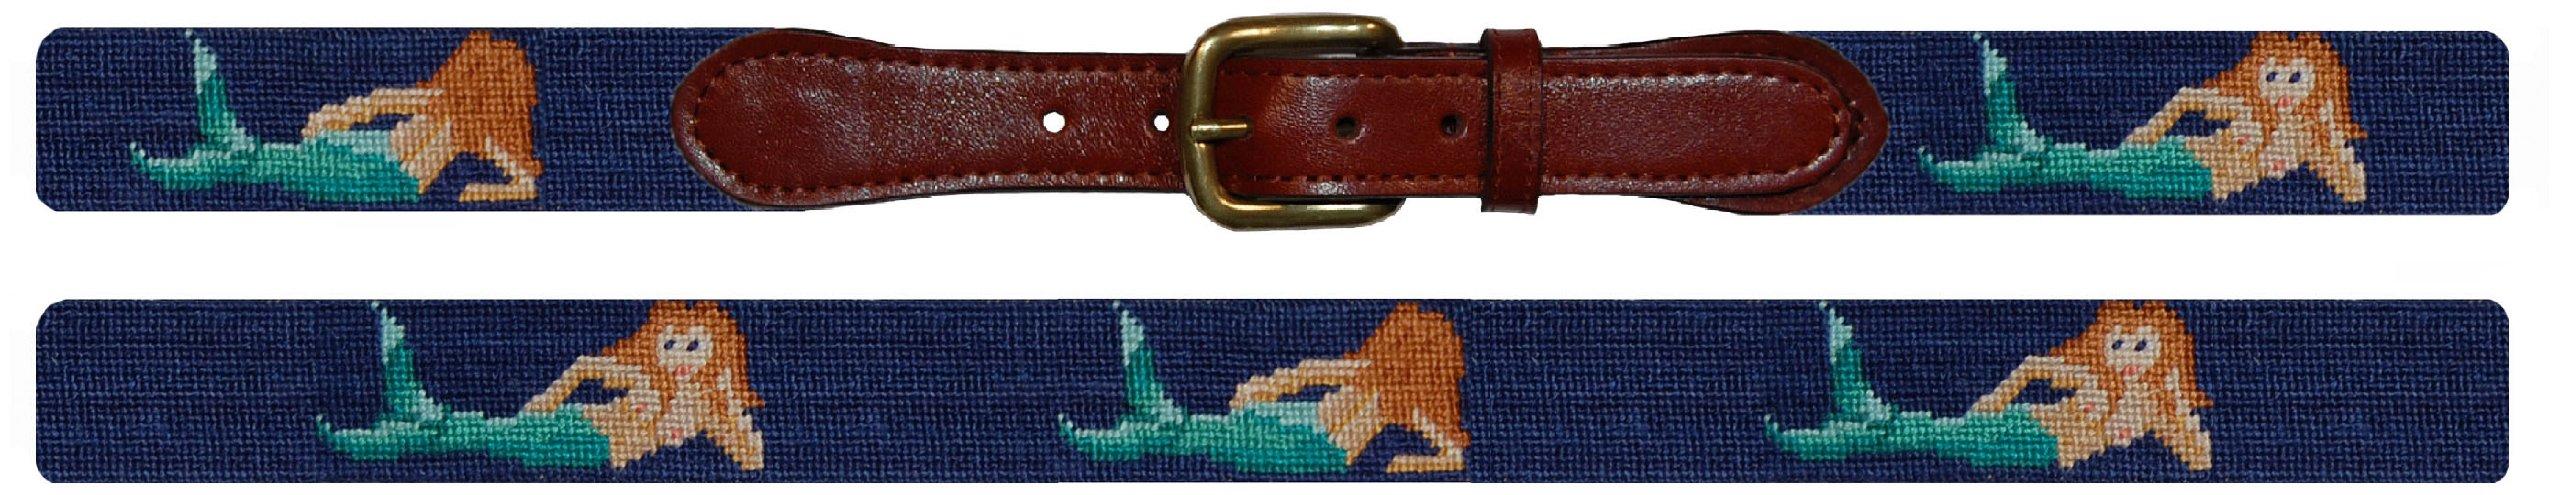 Smathers & Branson Mermaid Traditional Needlepoint Belt, Size 34 (B-099-34)